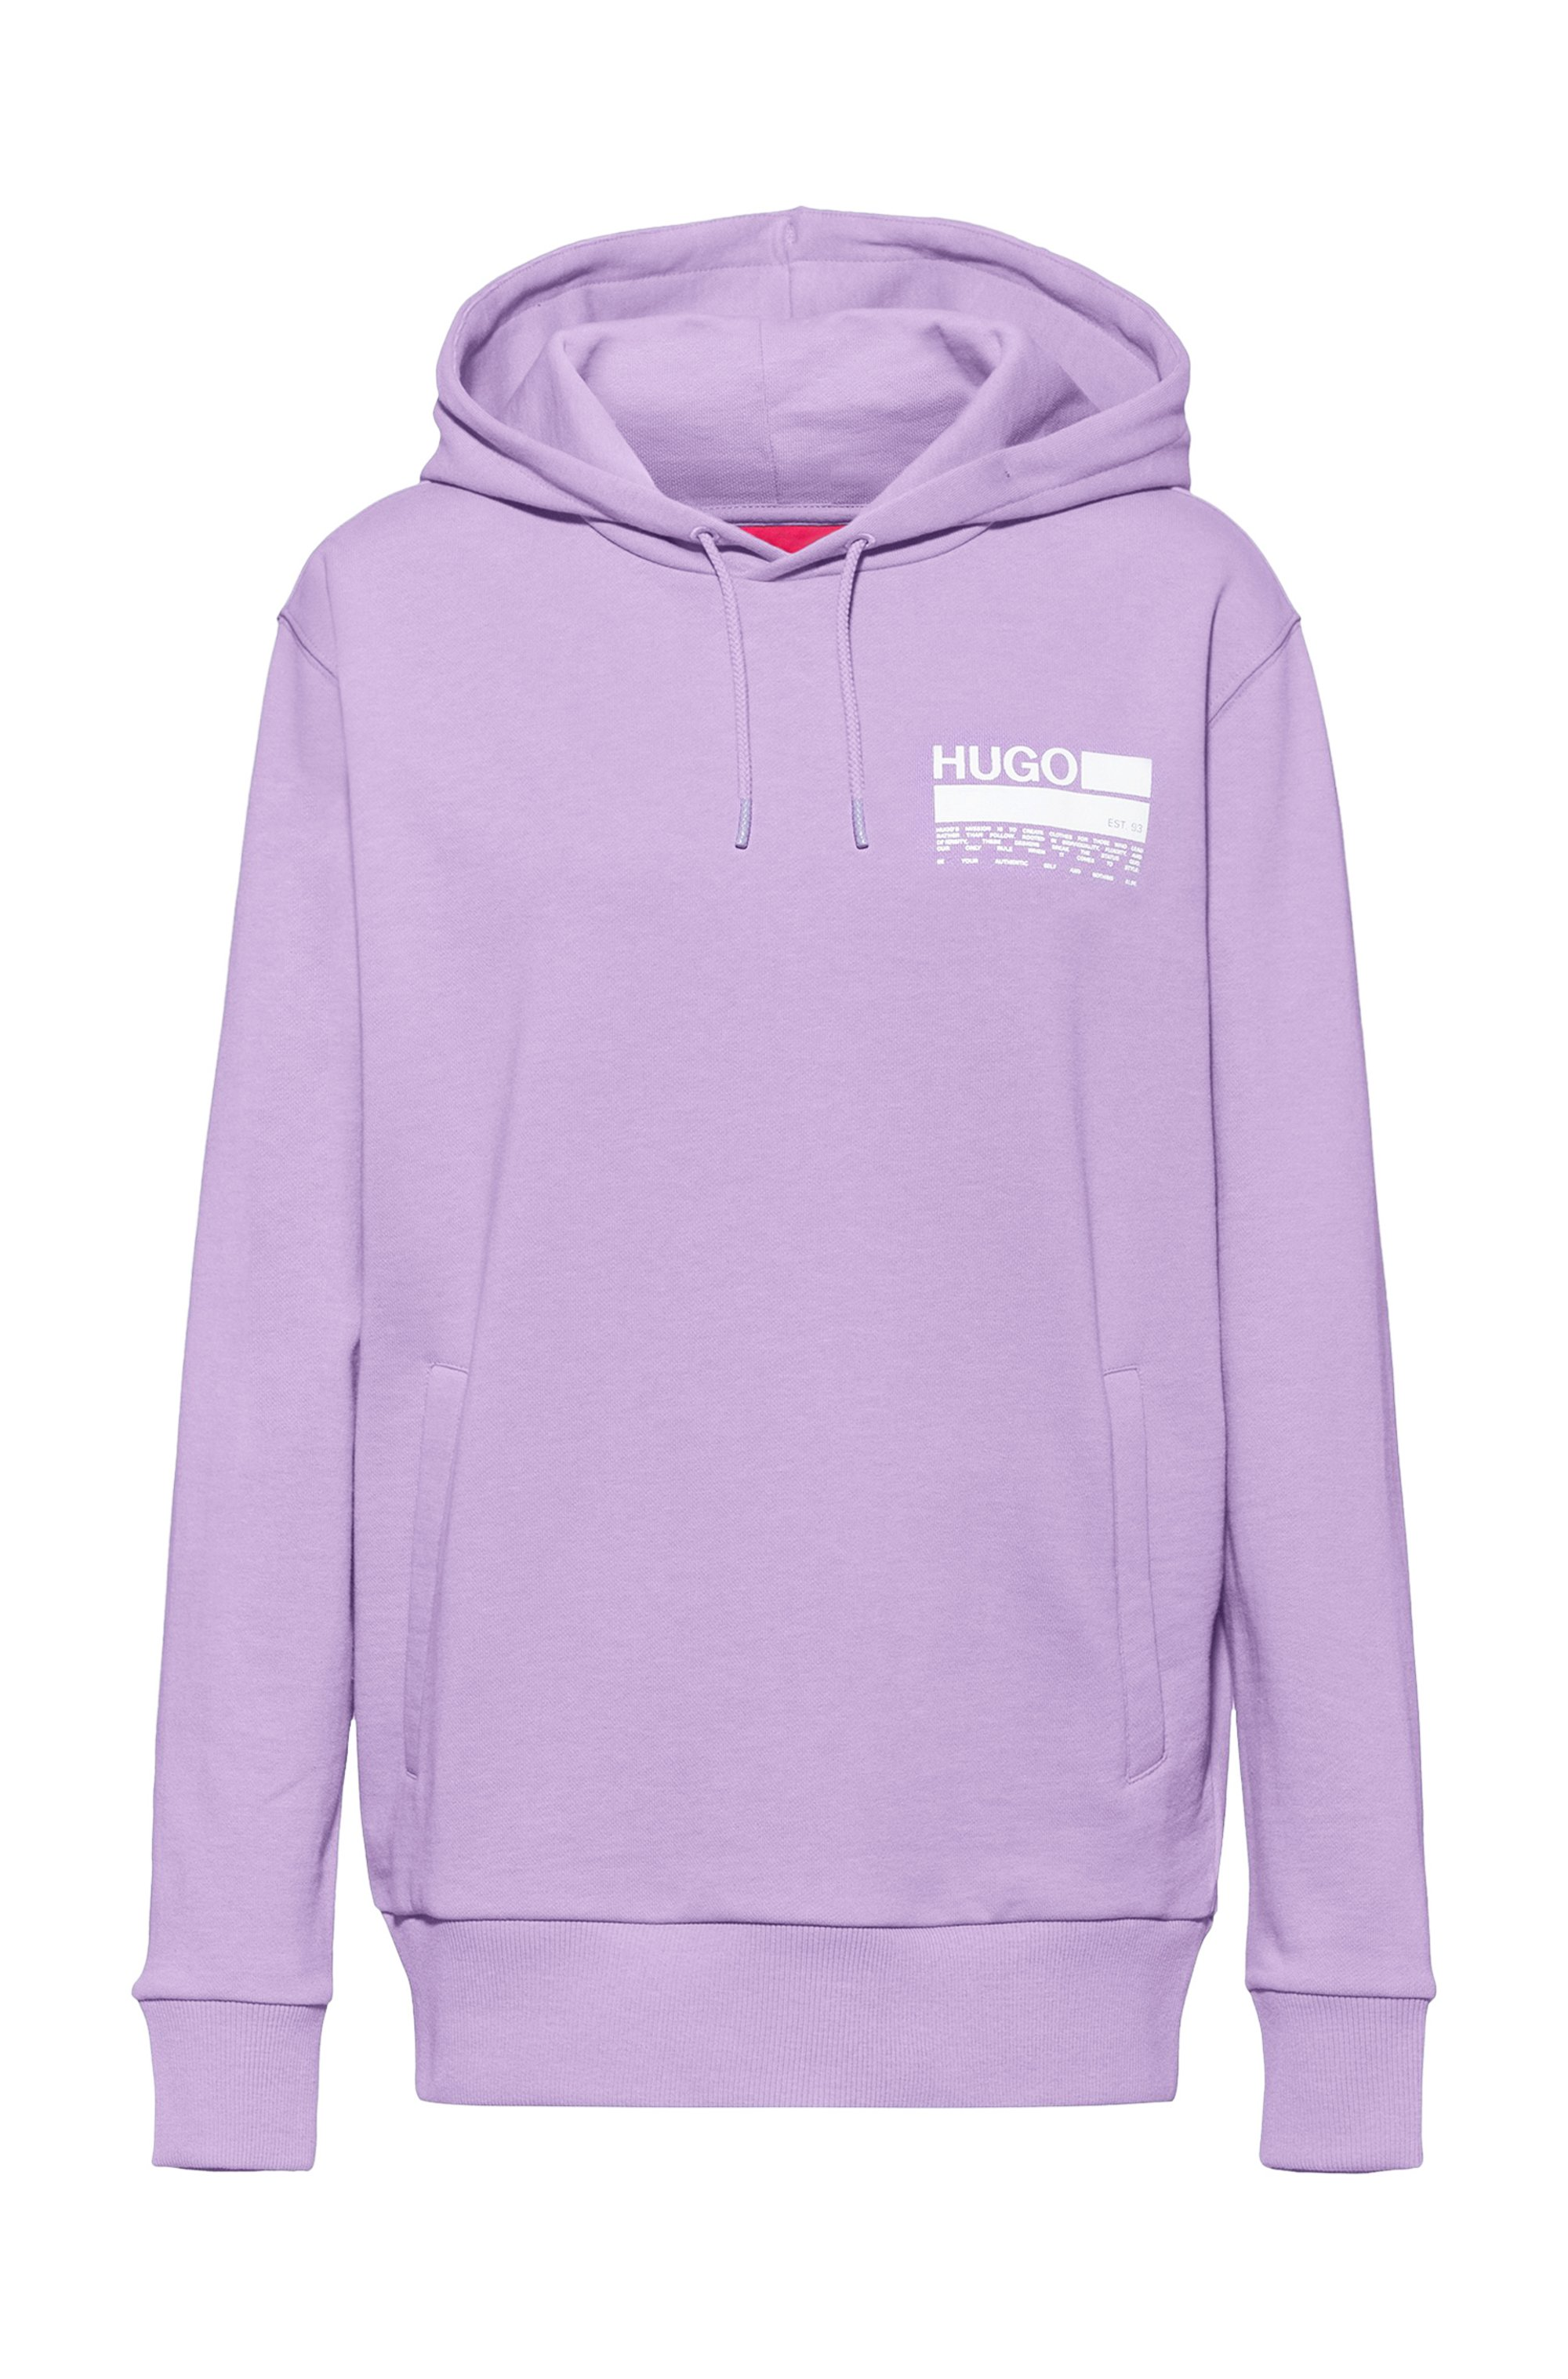 Manifesto-print hooded sweatshirt in Recot²® cotton, Purple